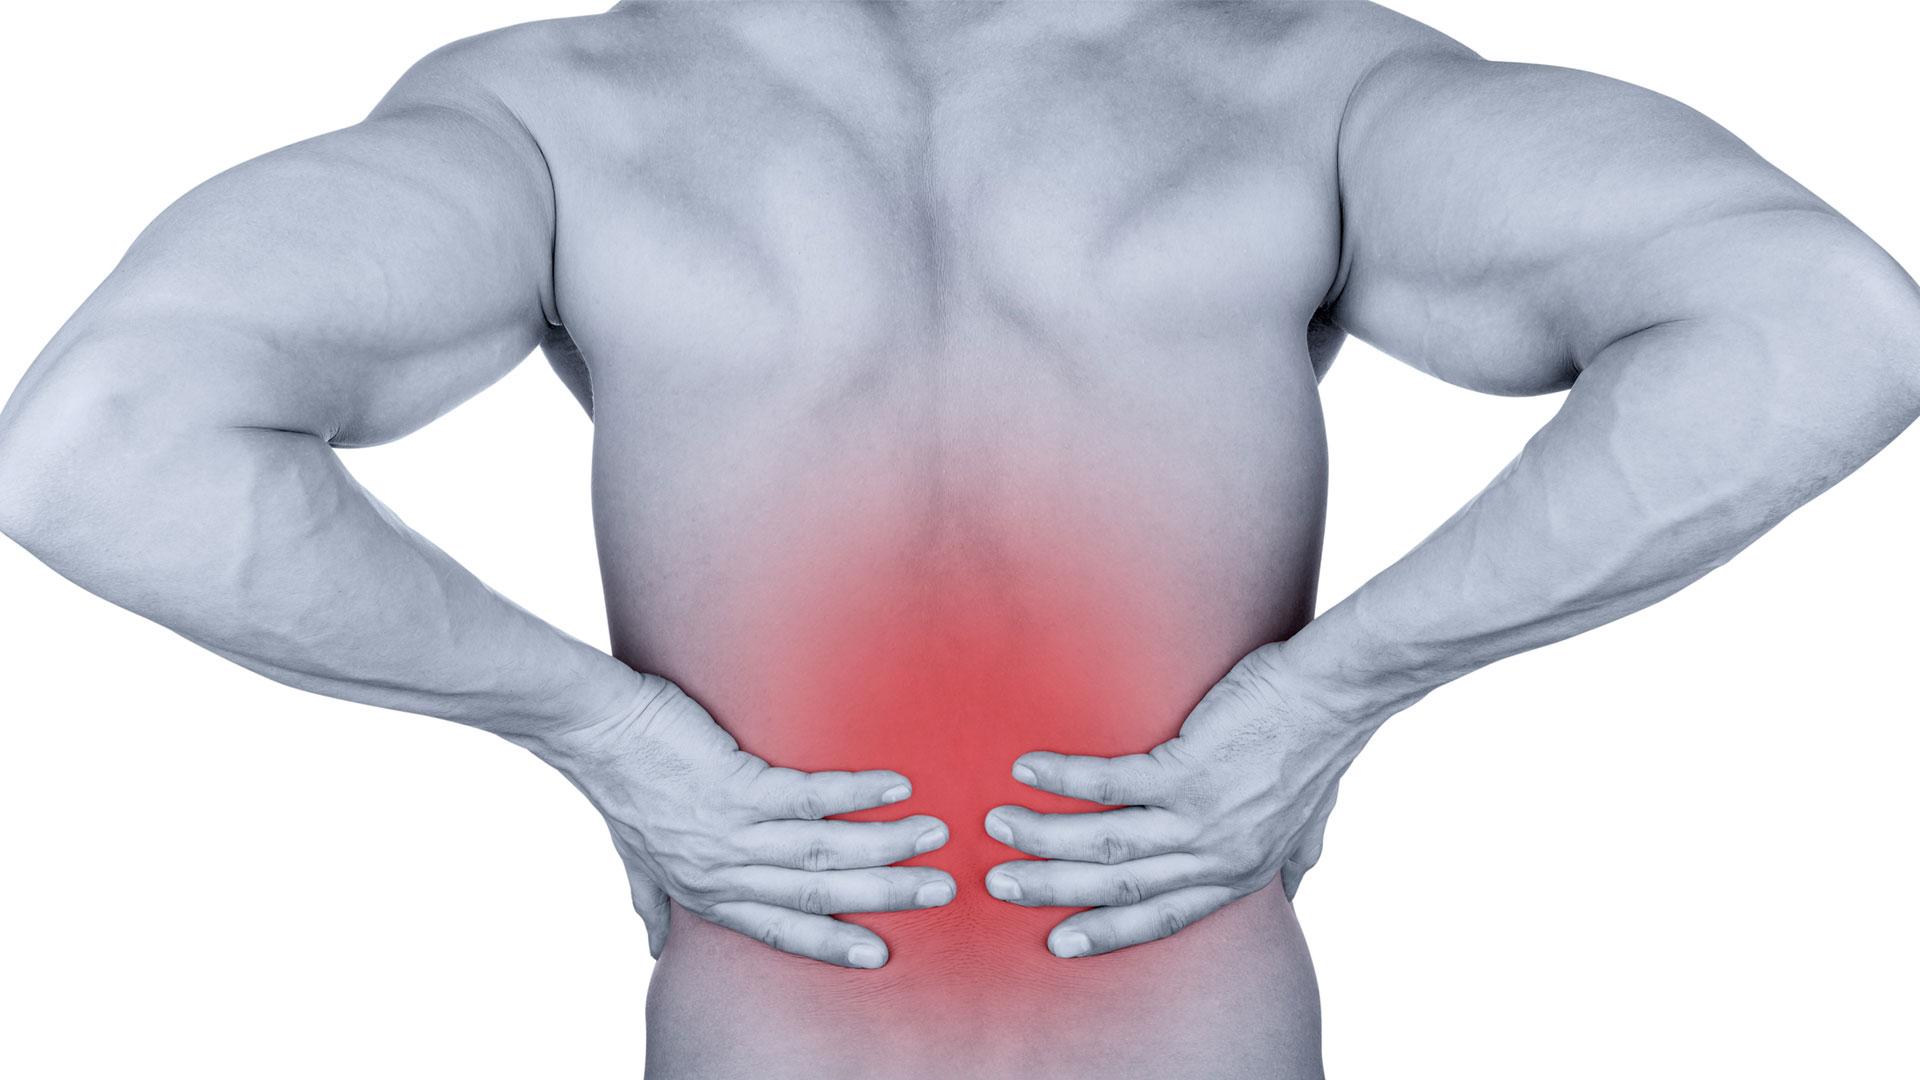 painhealth-low-back-pain-white-bg